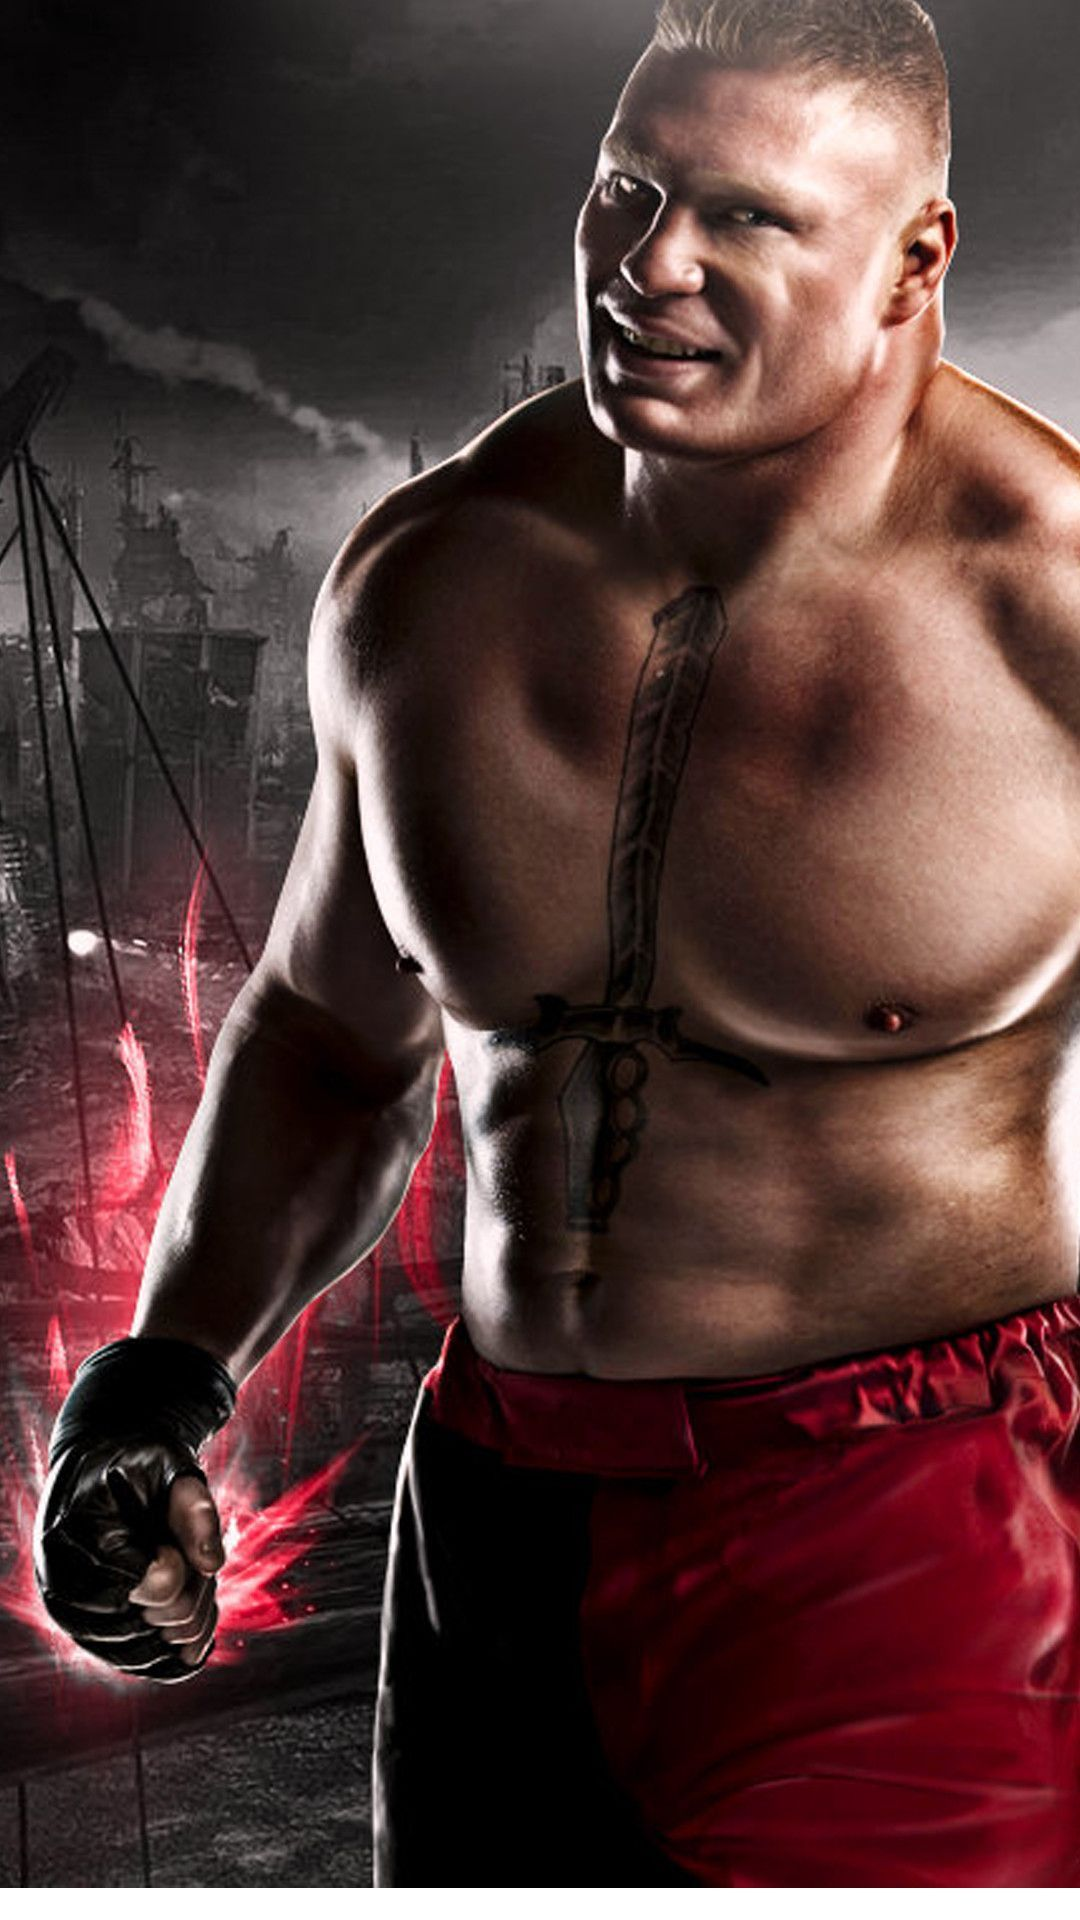 Seth Rollins HD Wallpapers Find best latest Seth Rollins